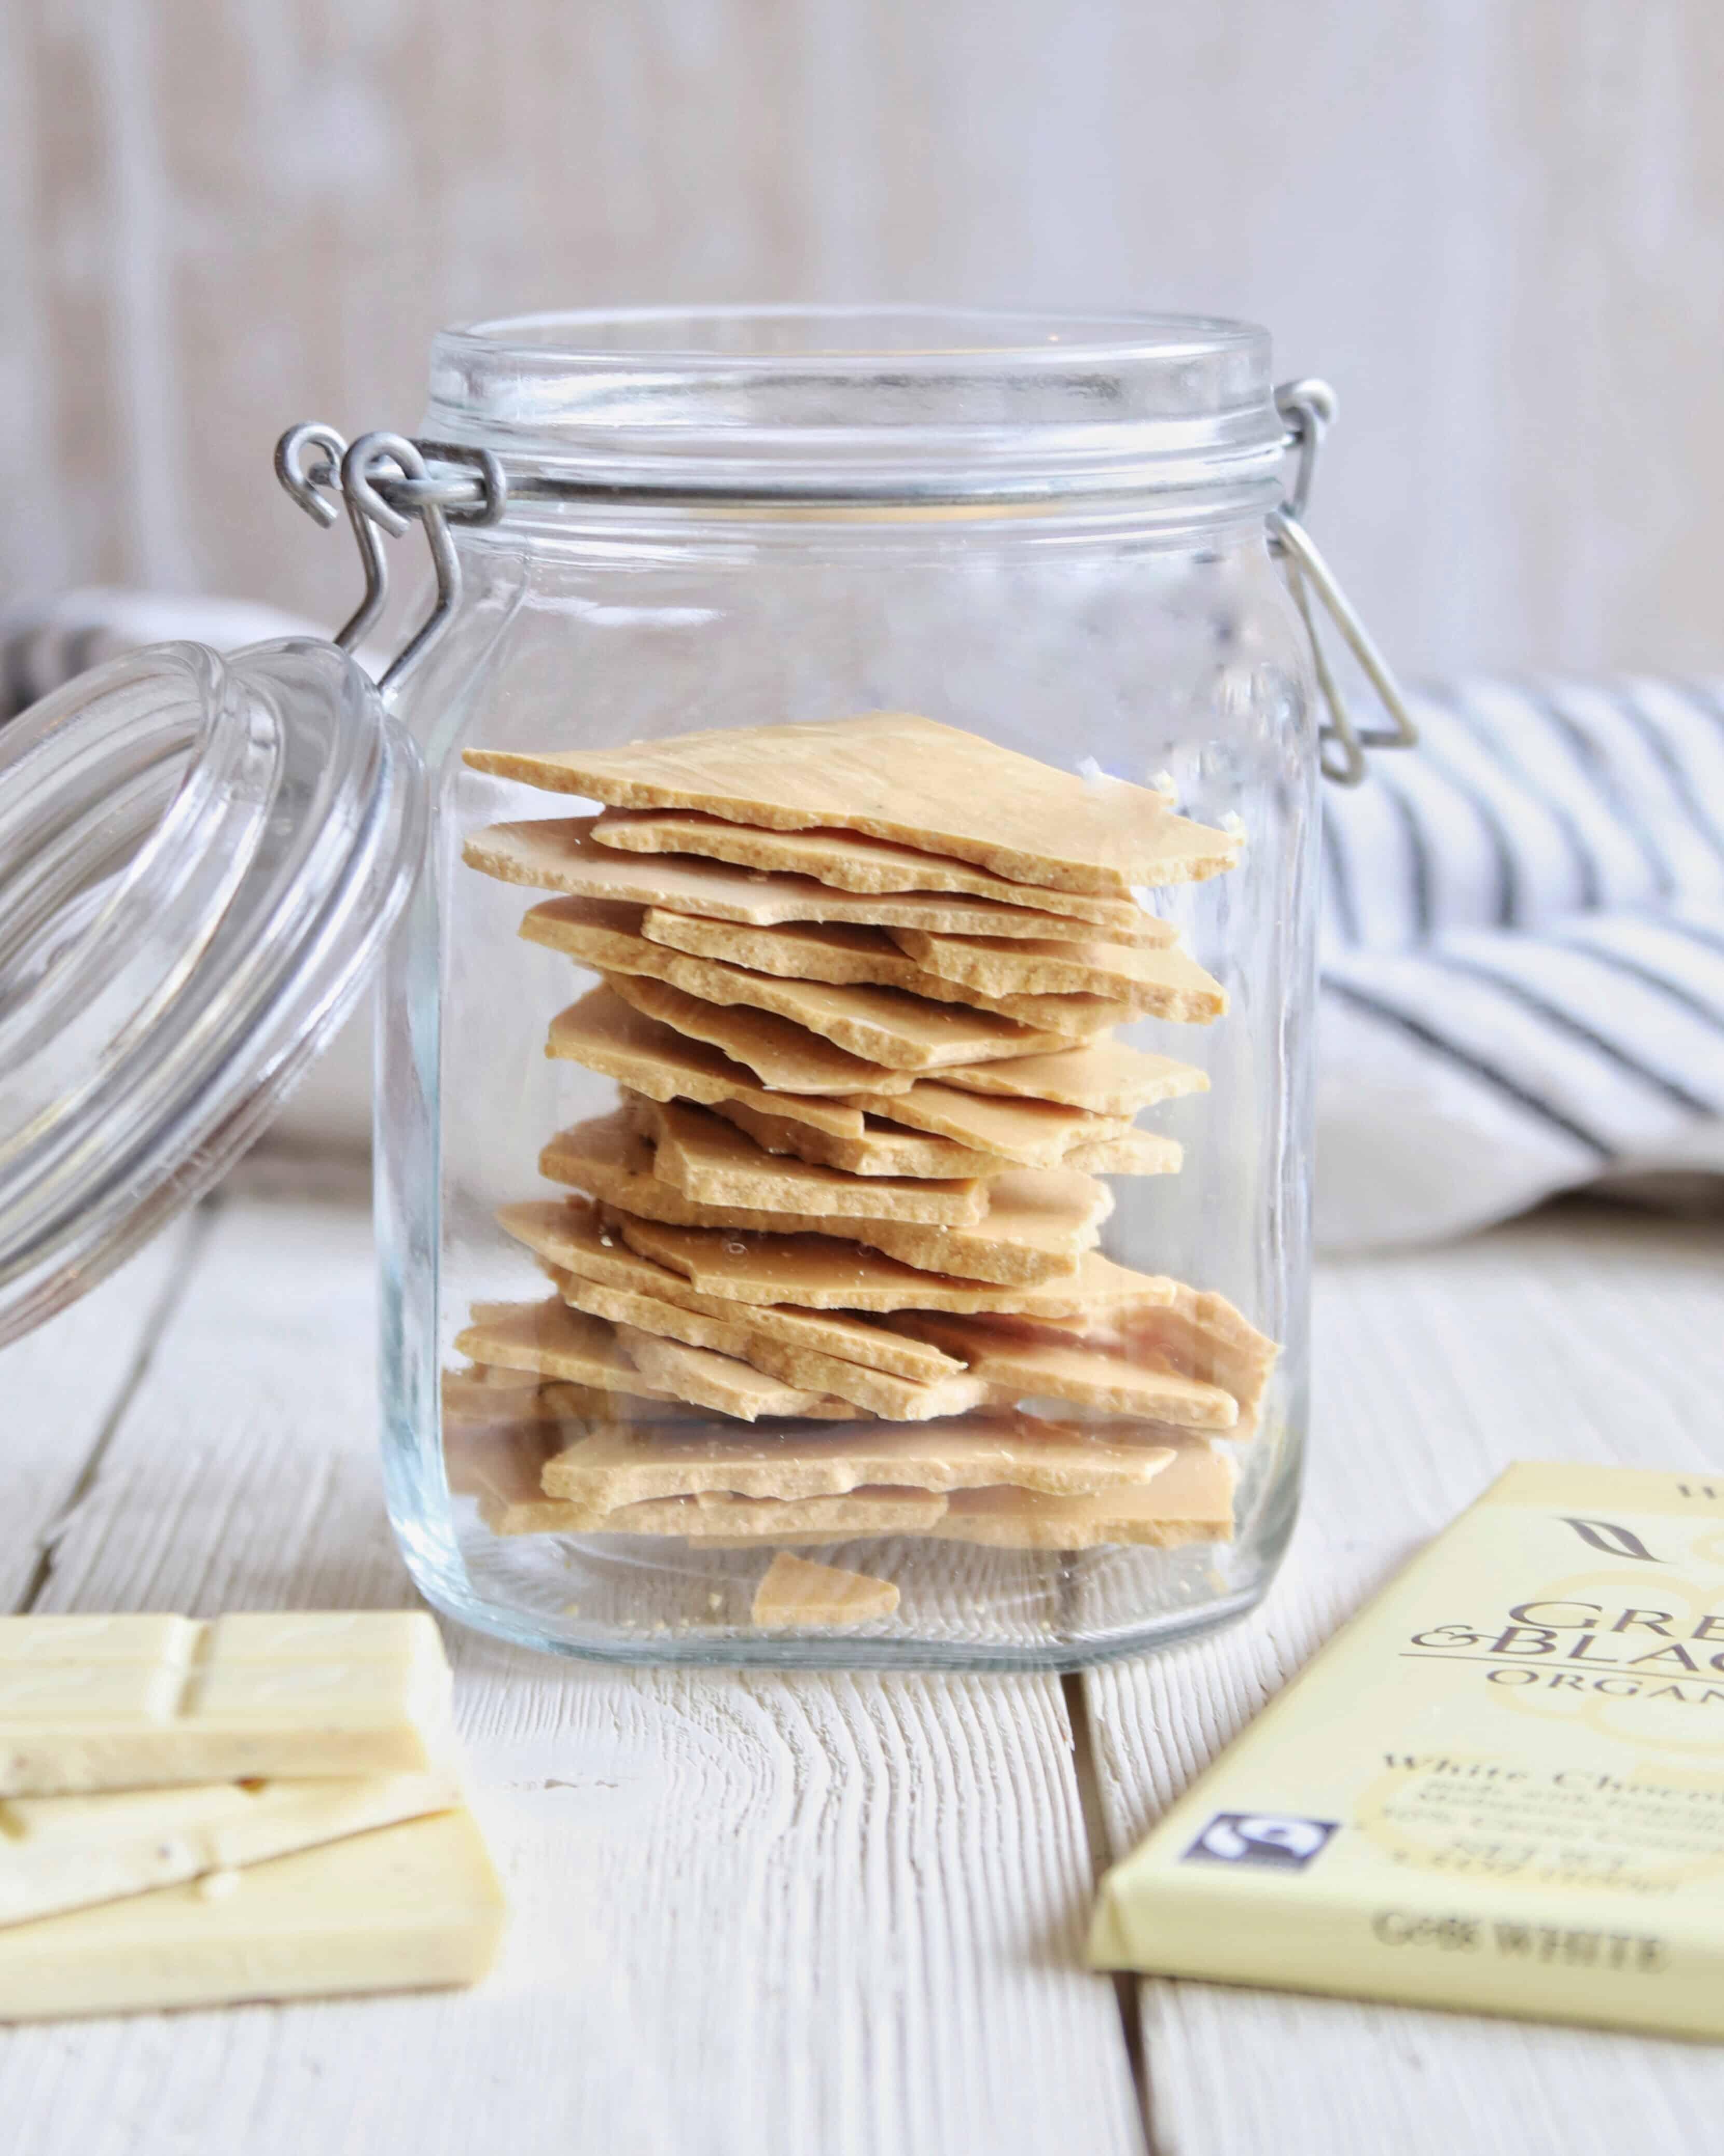 caramelized white chocolate in glass jar